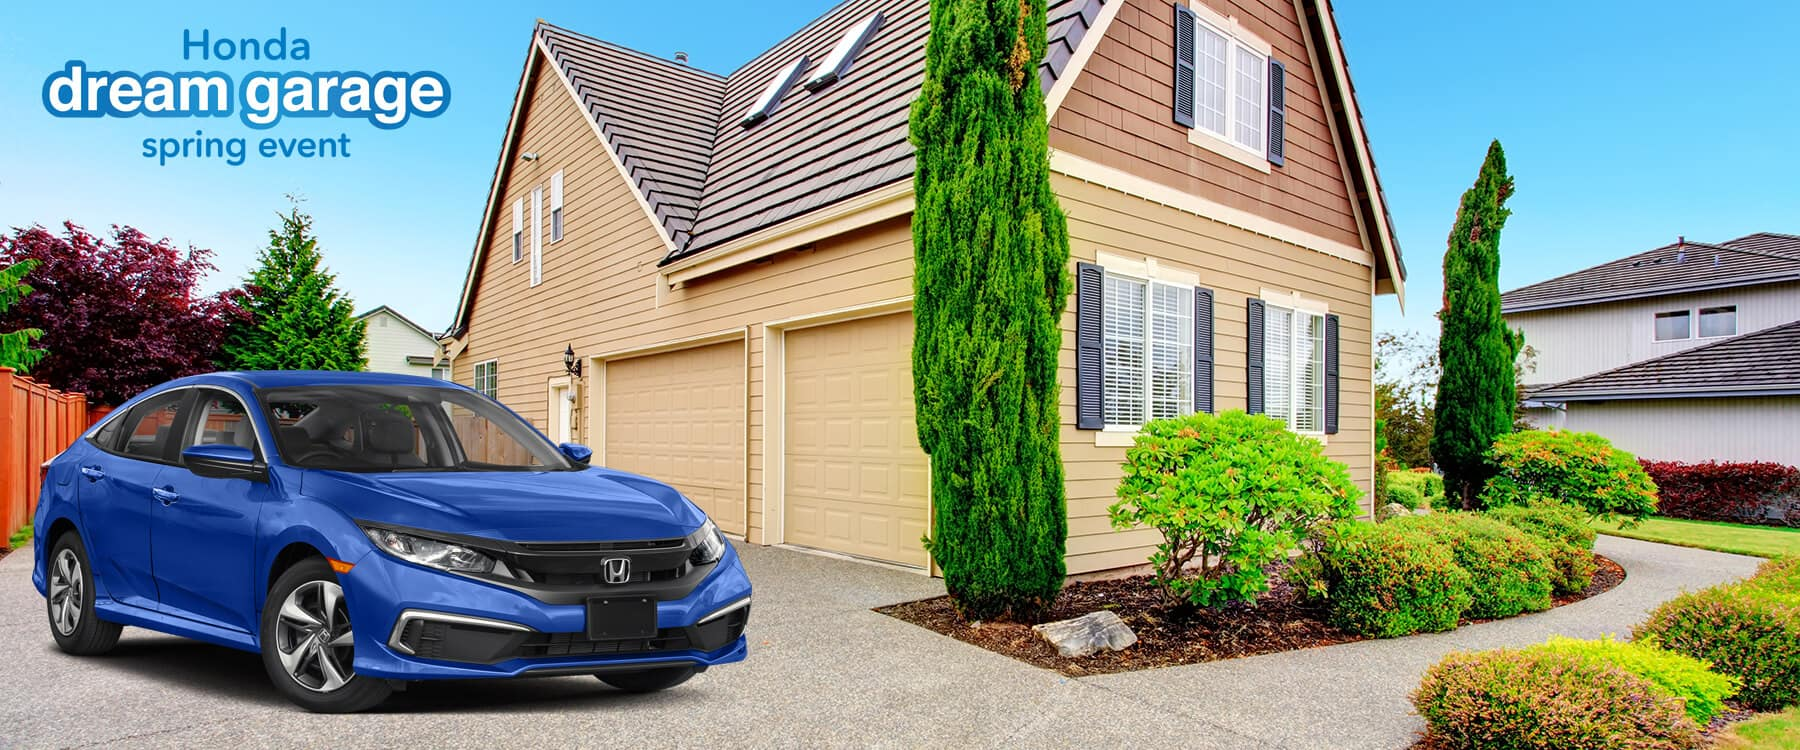 Honda Dream Garage Spring Event 2019 Civic Slider